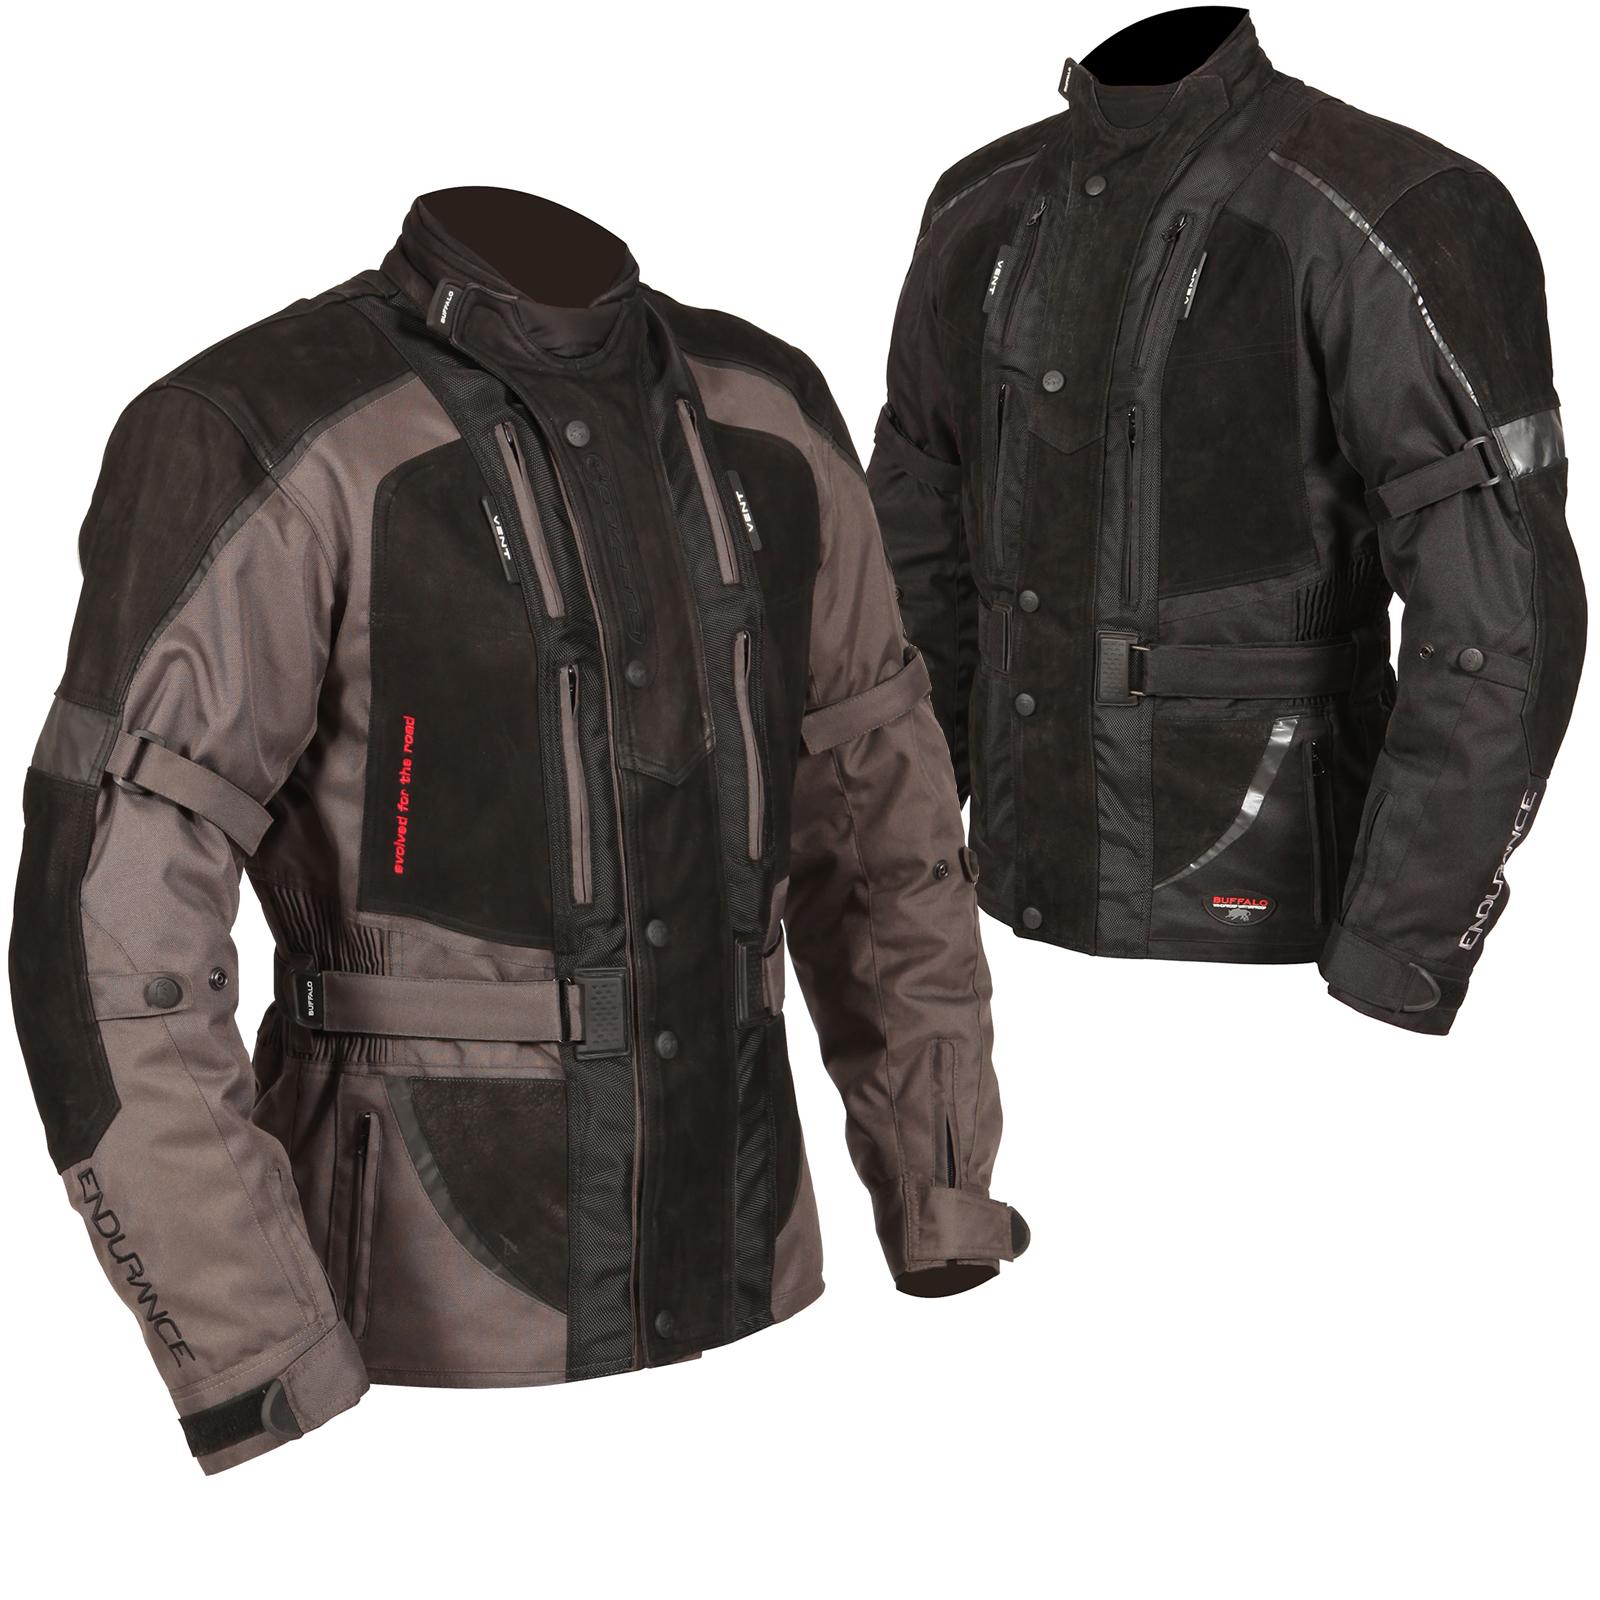 Buffalo Endurance Motorcycle Jacket Jackets Ghostbikes Com